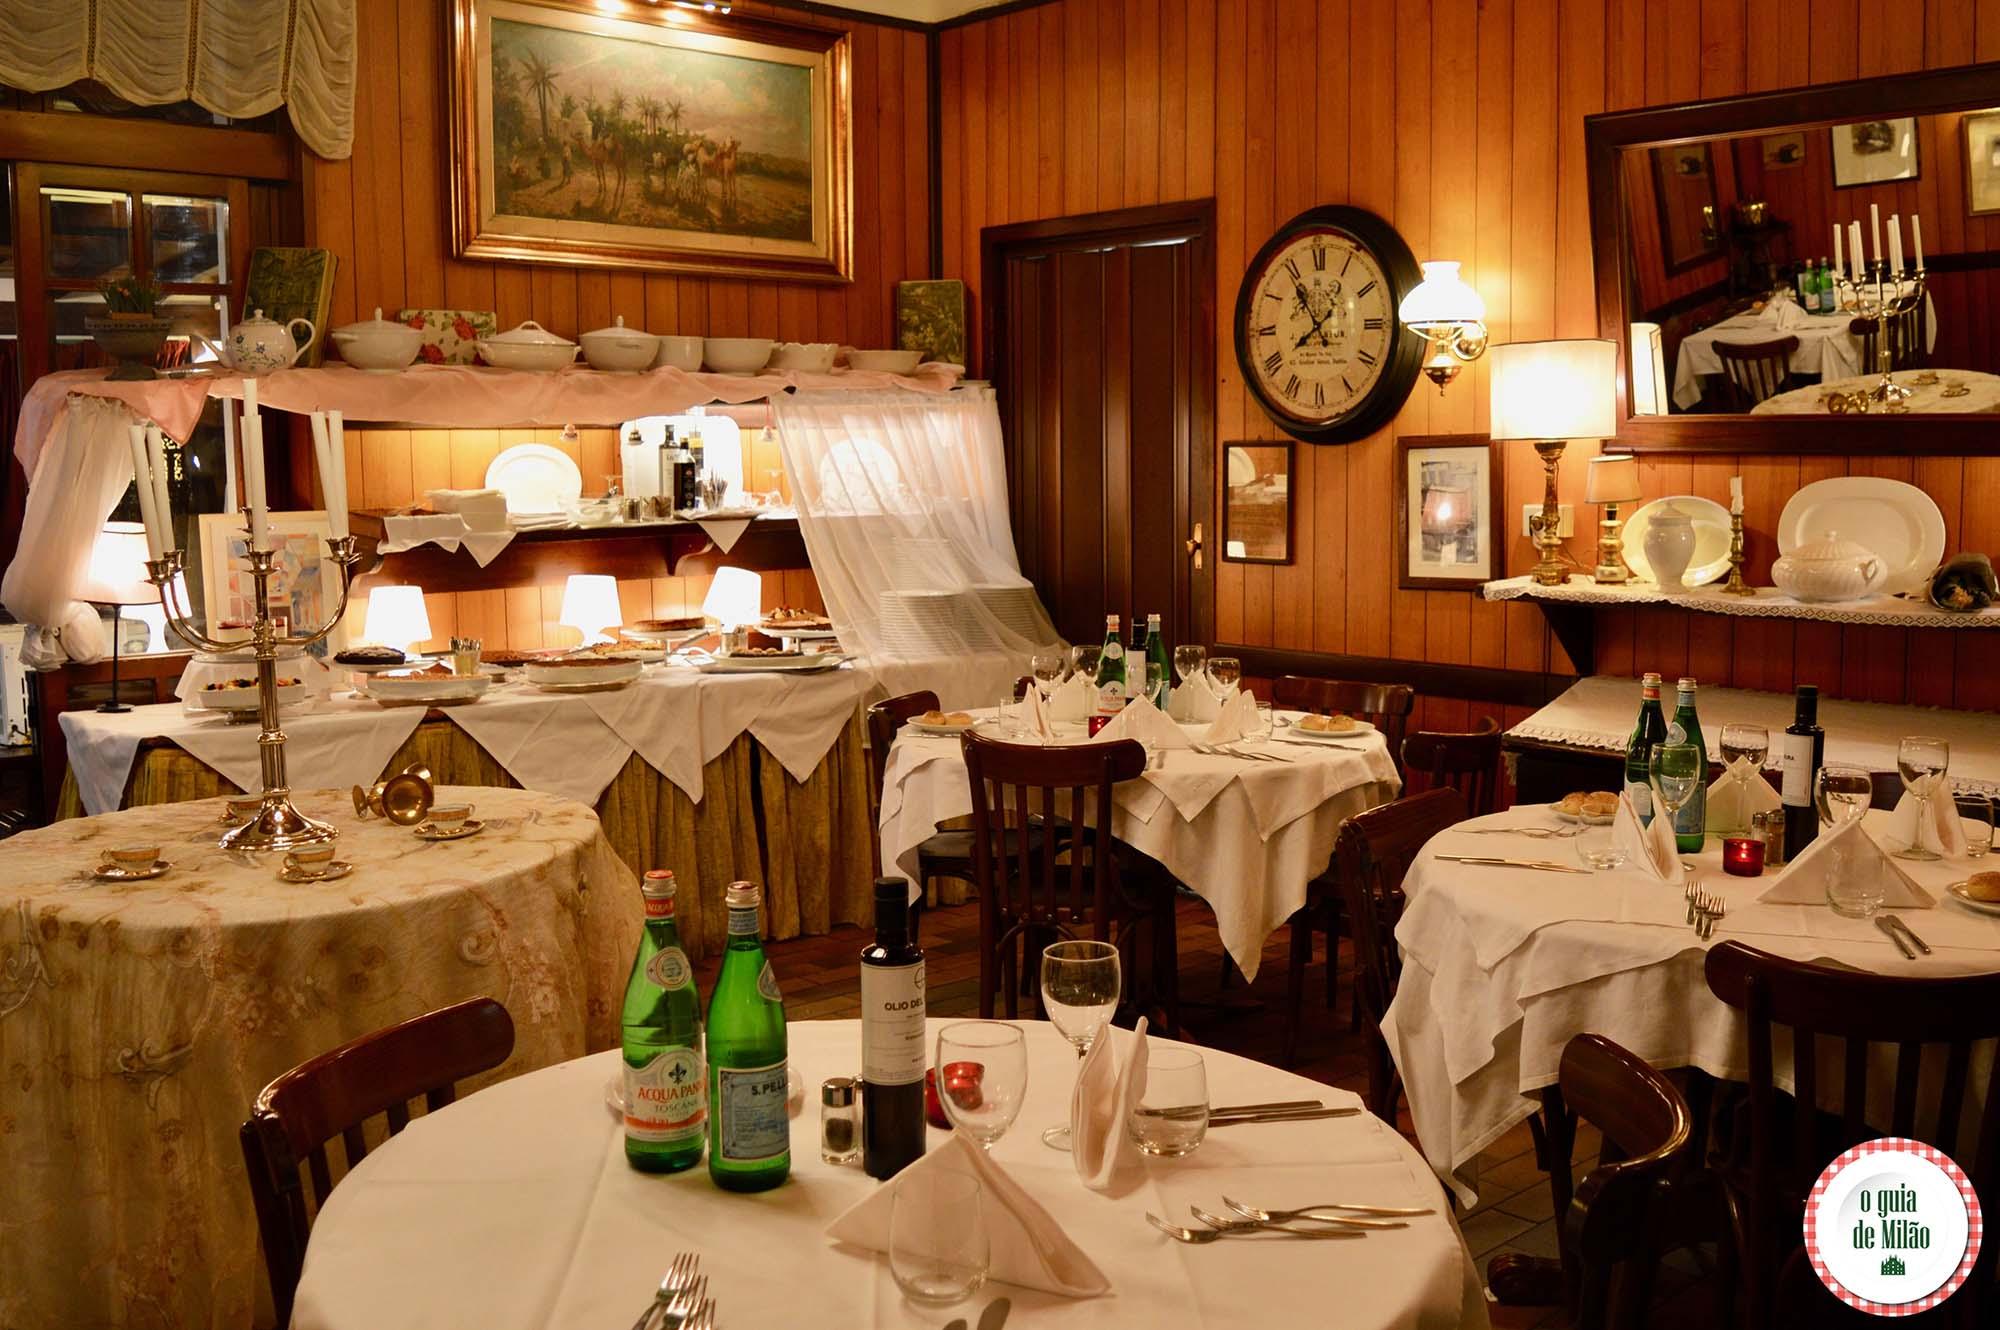 Restaurant Onde  Ef Bf Bd Gravado O Hell S Kitchen New York